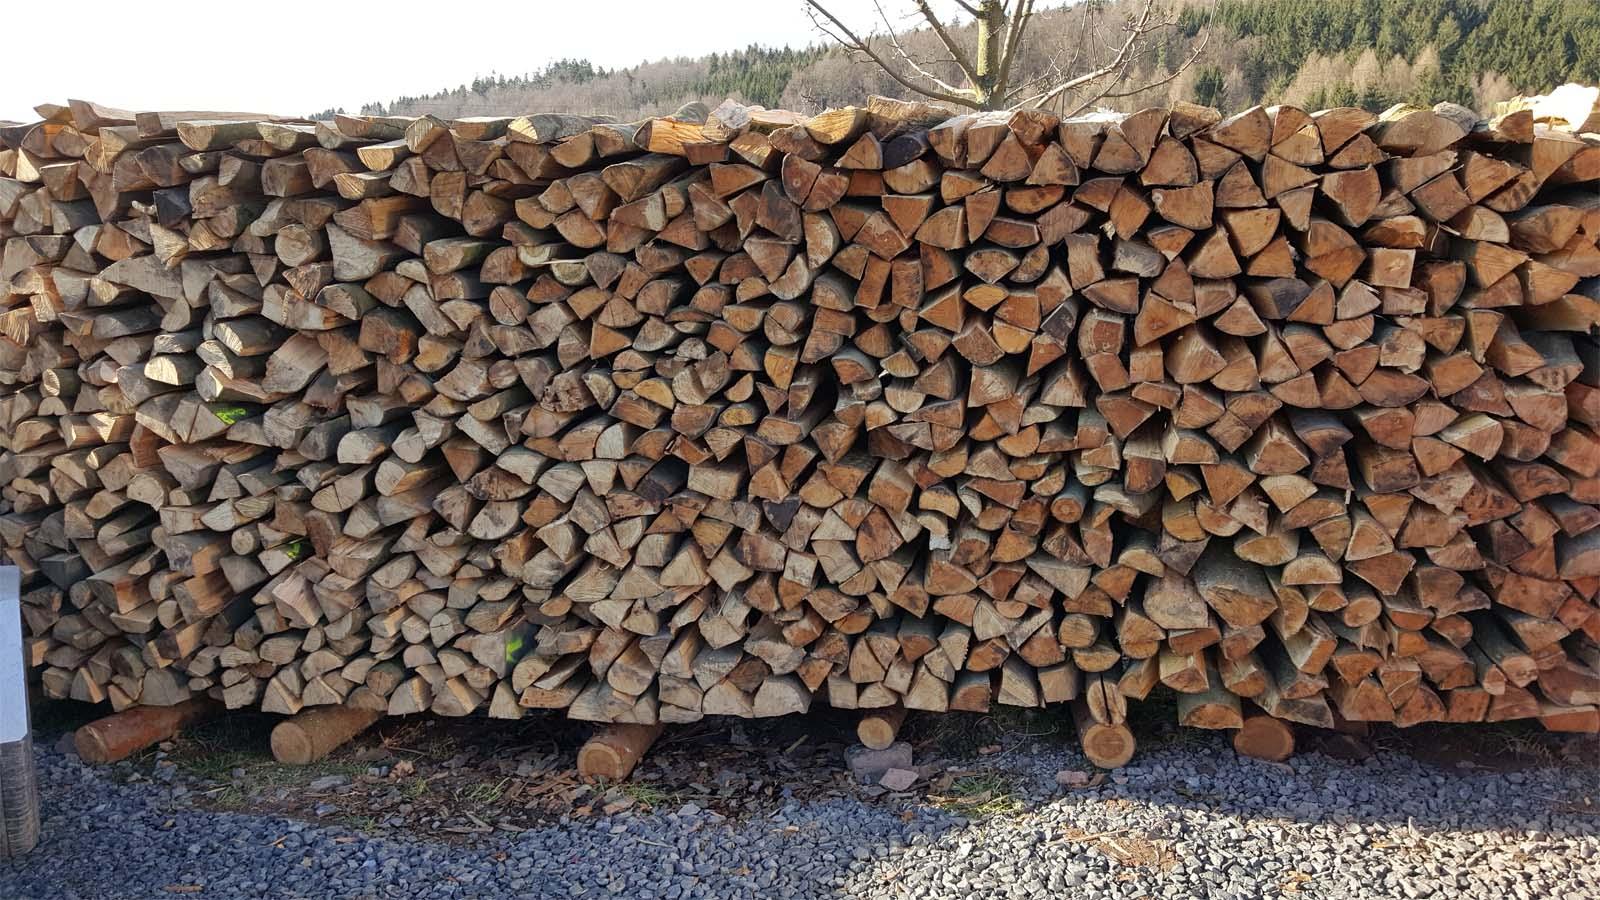 Gestapelte Holzscheide